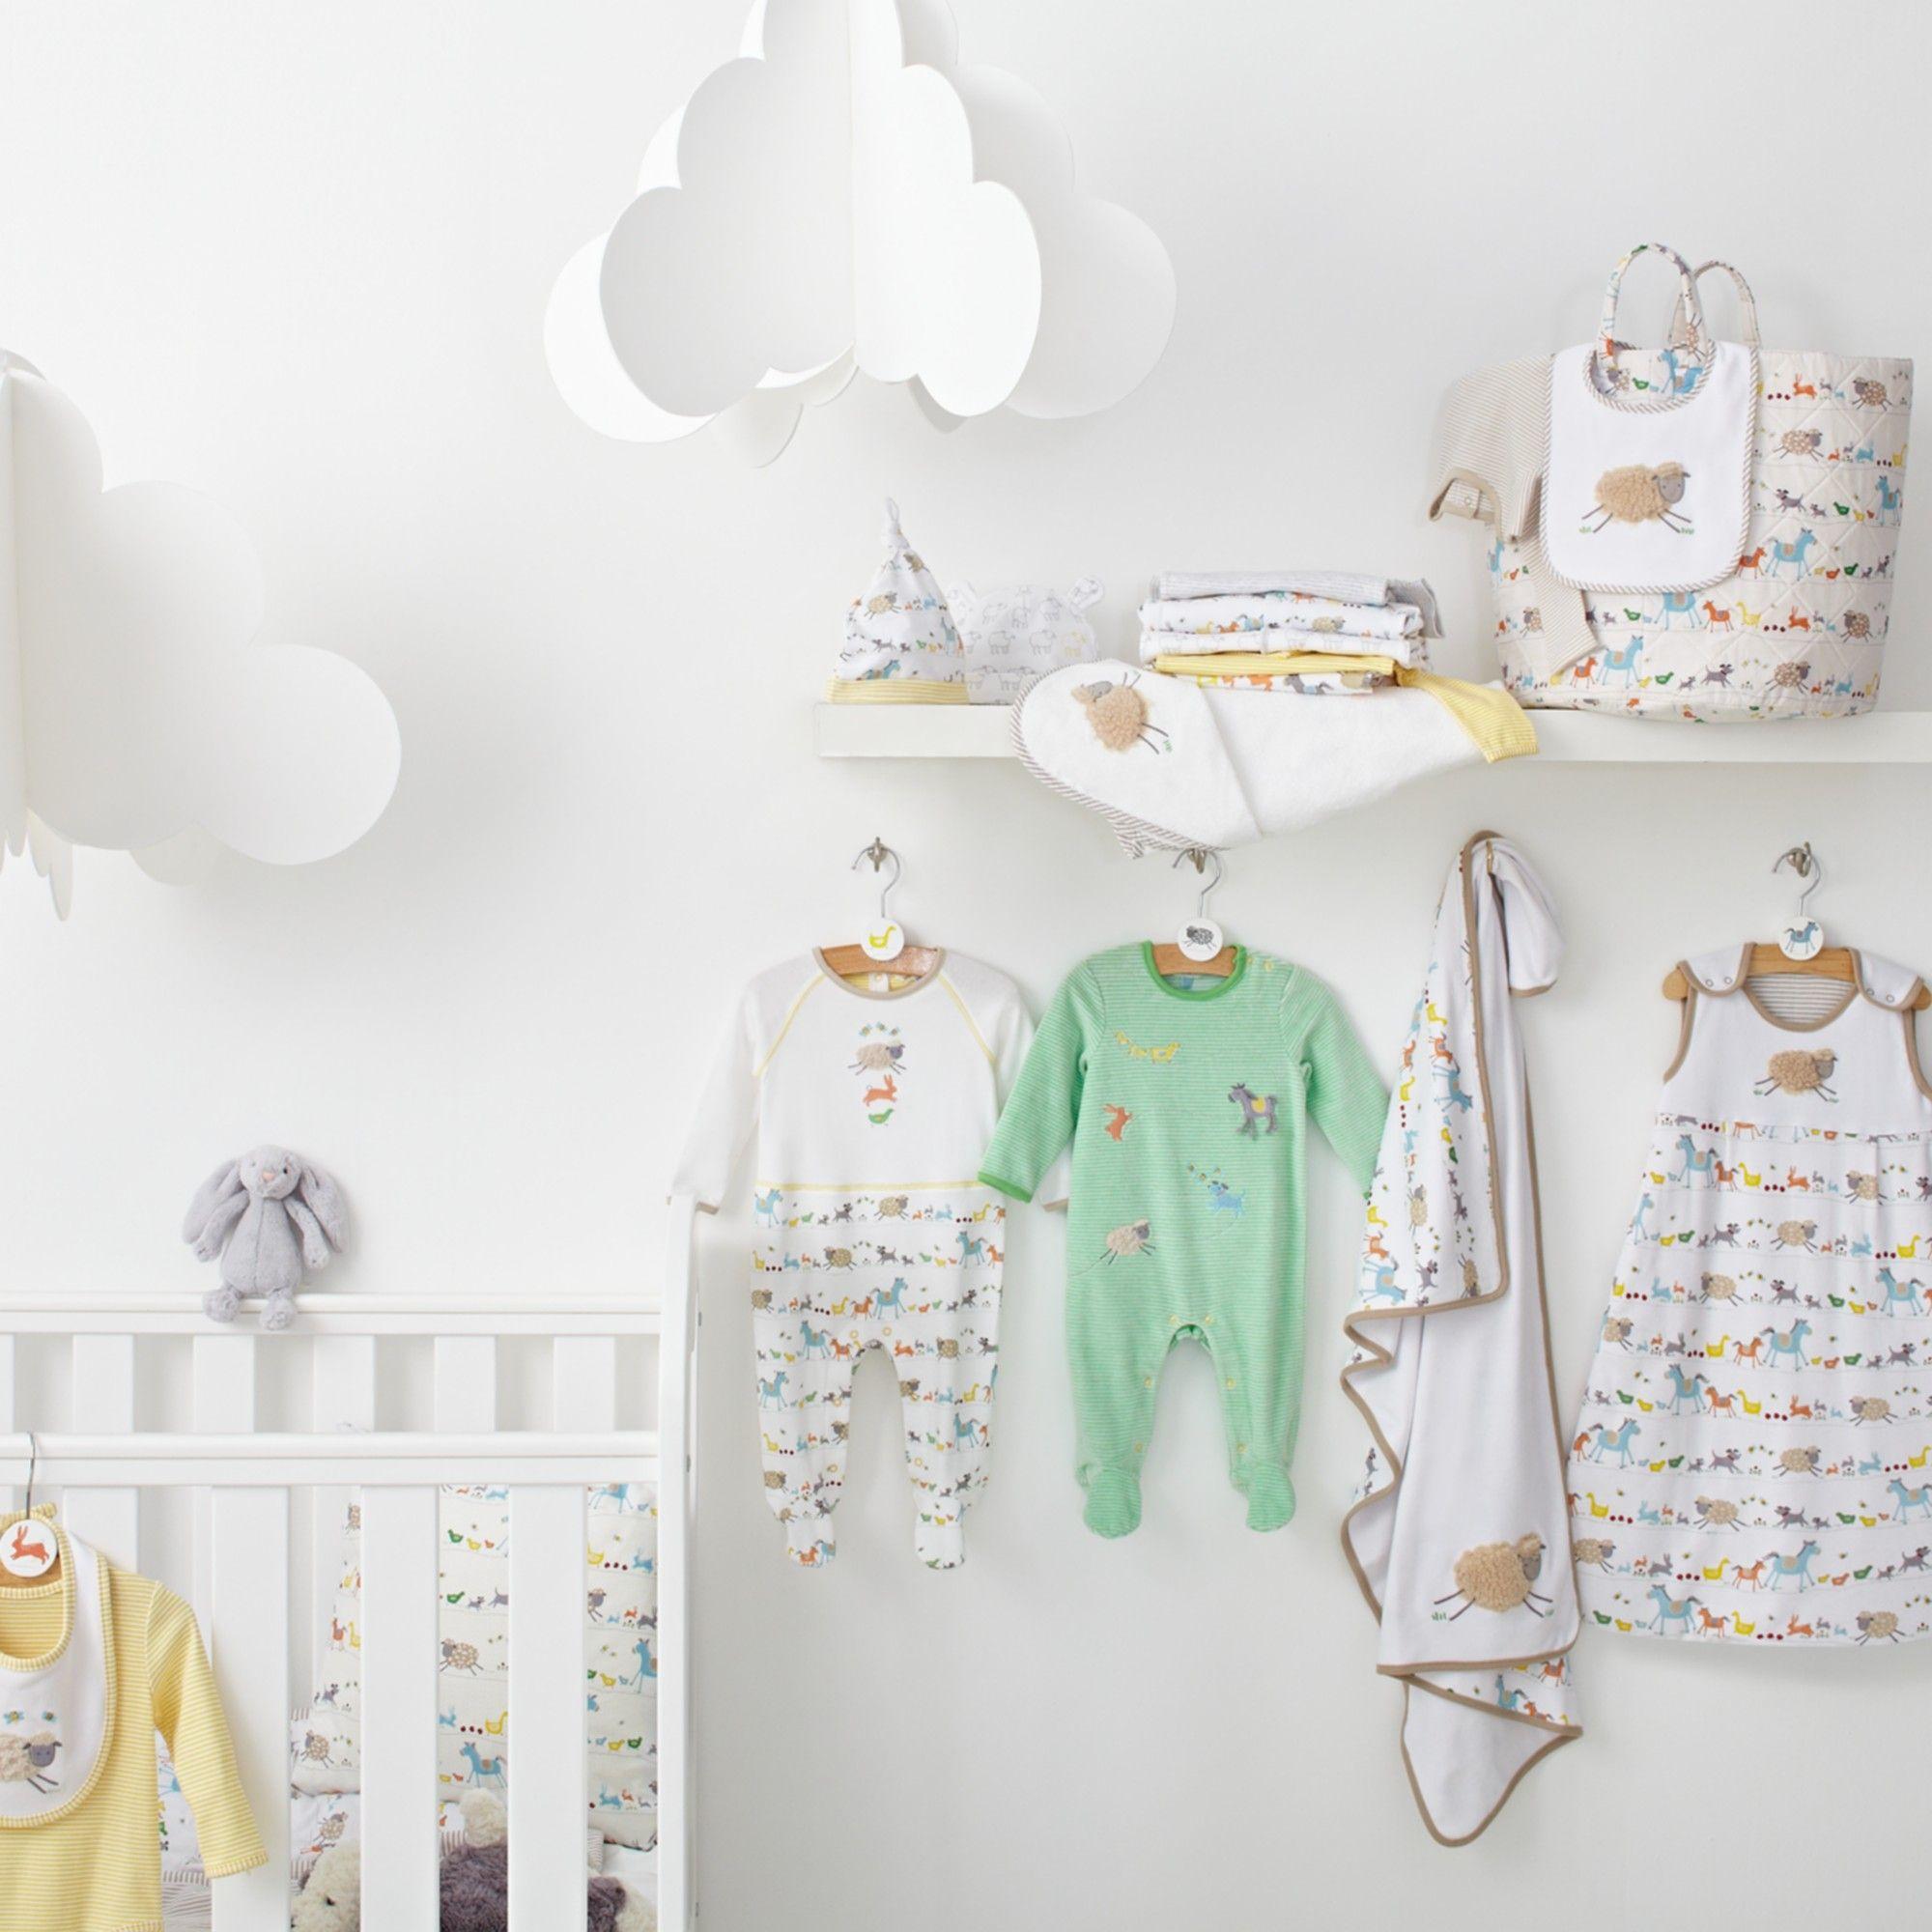 Farmyard babywear u nursery coordinated ranges nursery nursery